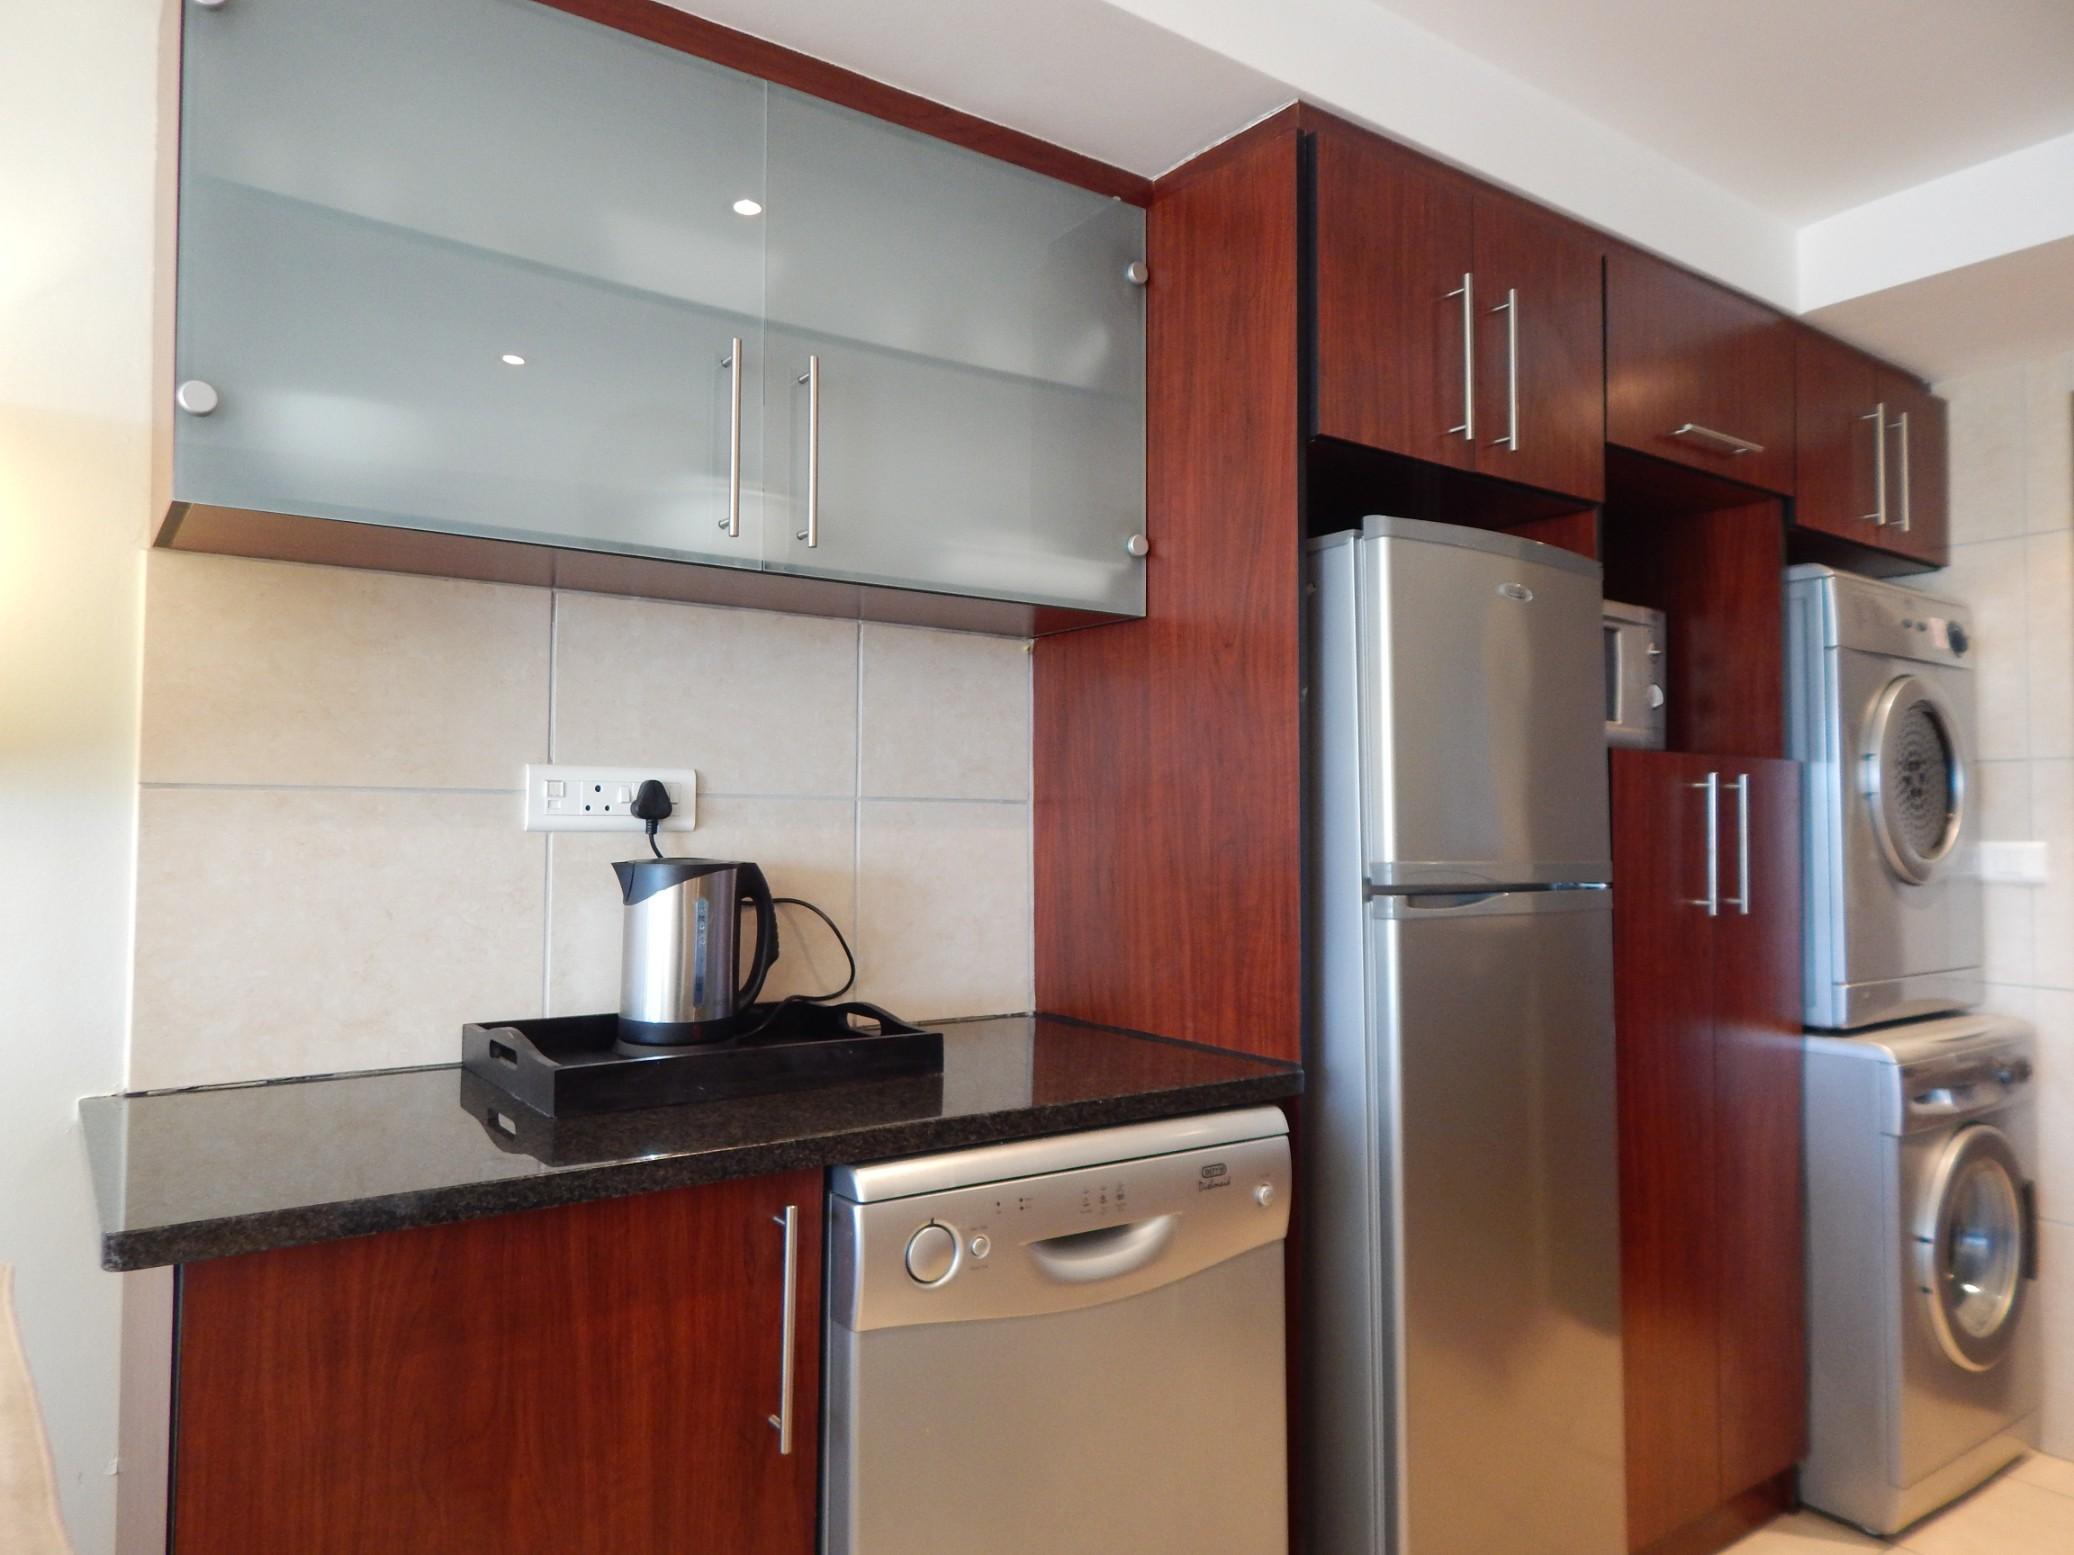 2 Bedroom Apartment for sale in De Bakke ENT0067862 : photo#16